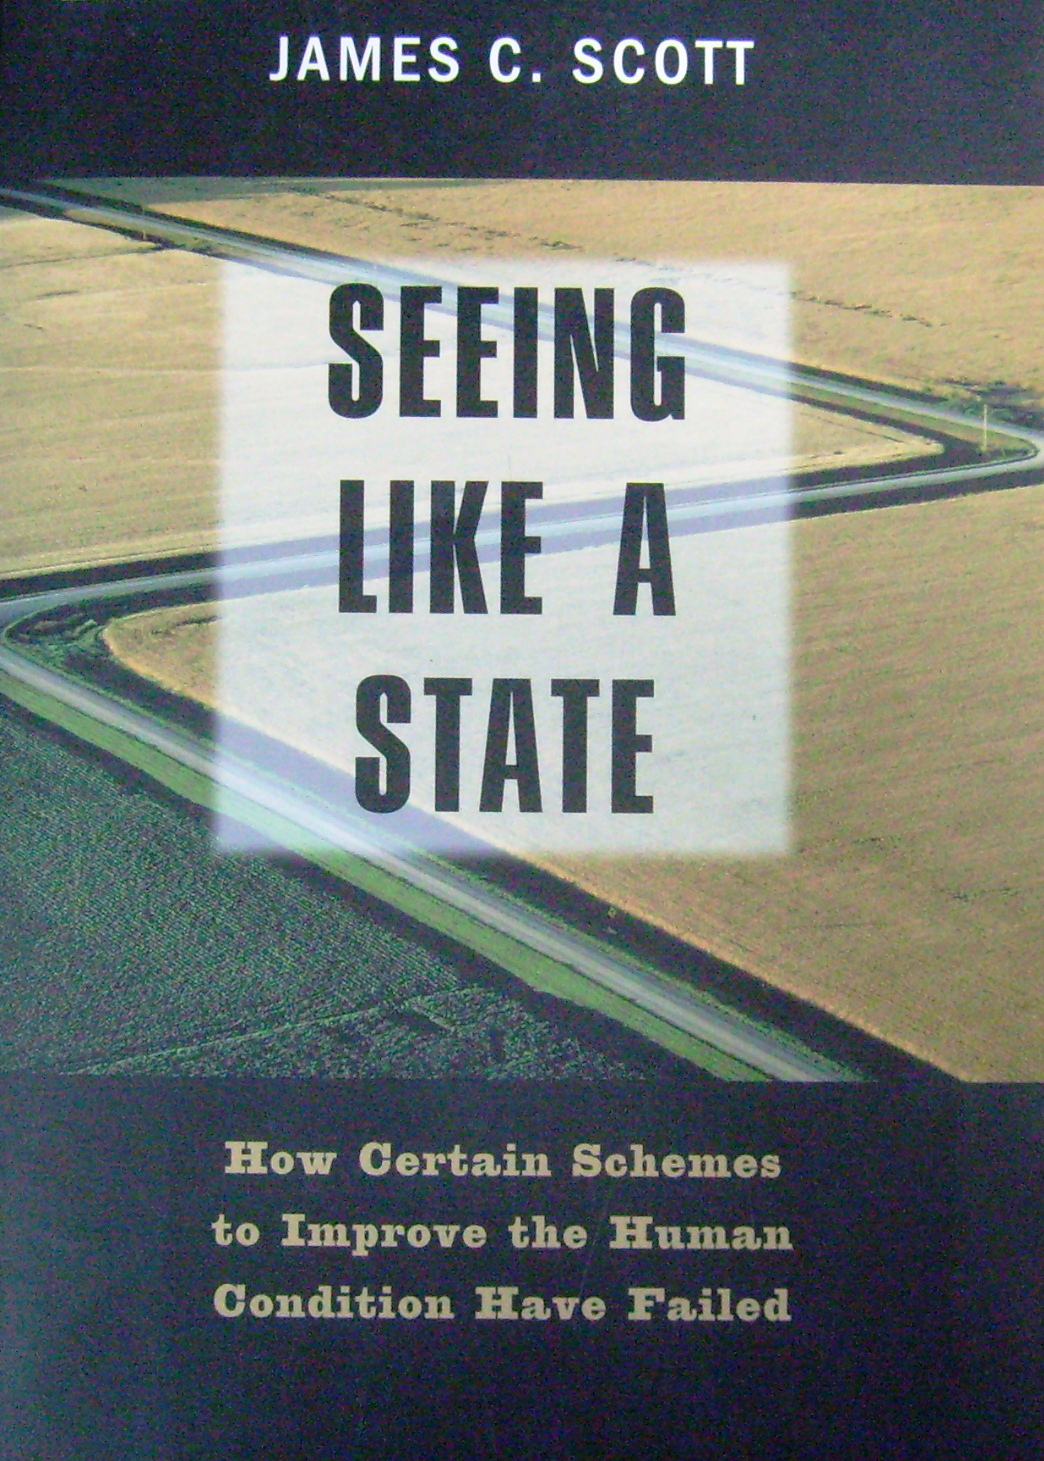 Scott, James - Seeing like a State.jpg